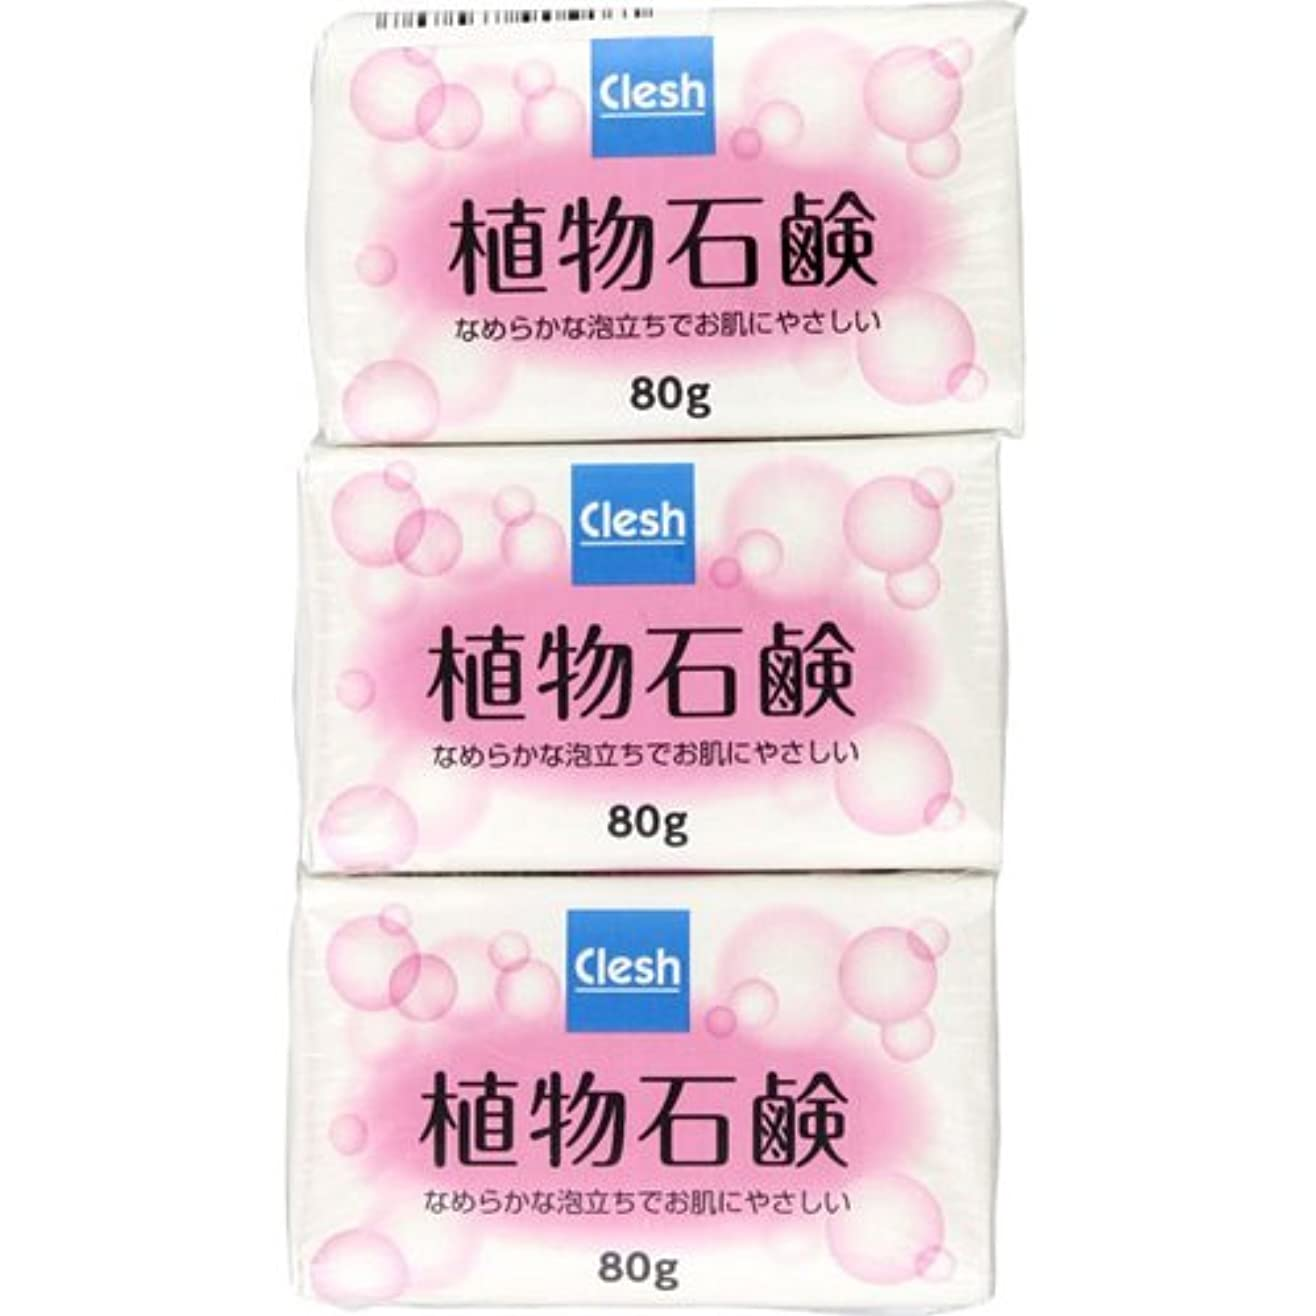 Clesh(クレシュ) 植物石鹸 80g×3個